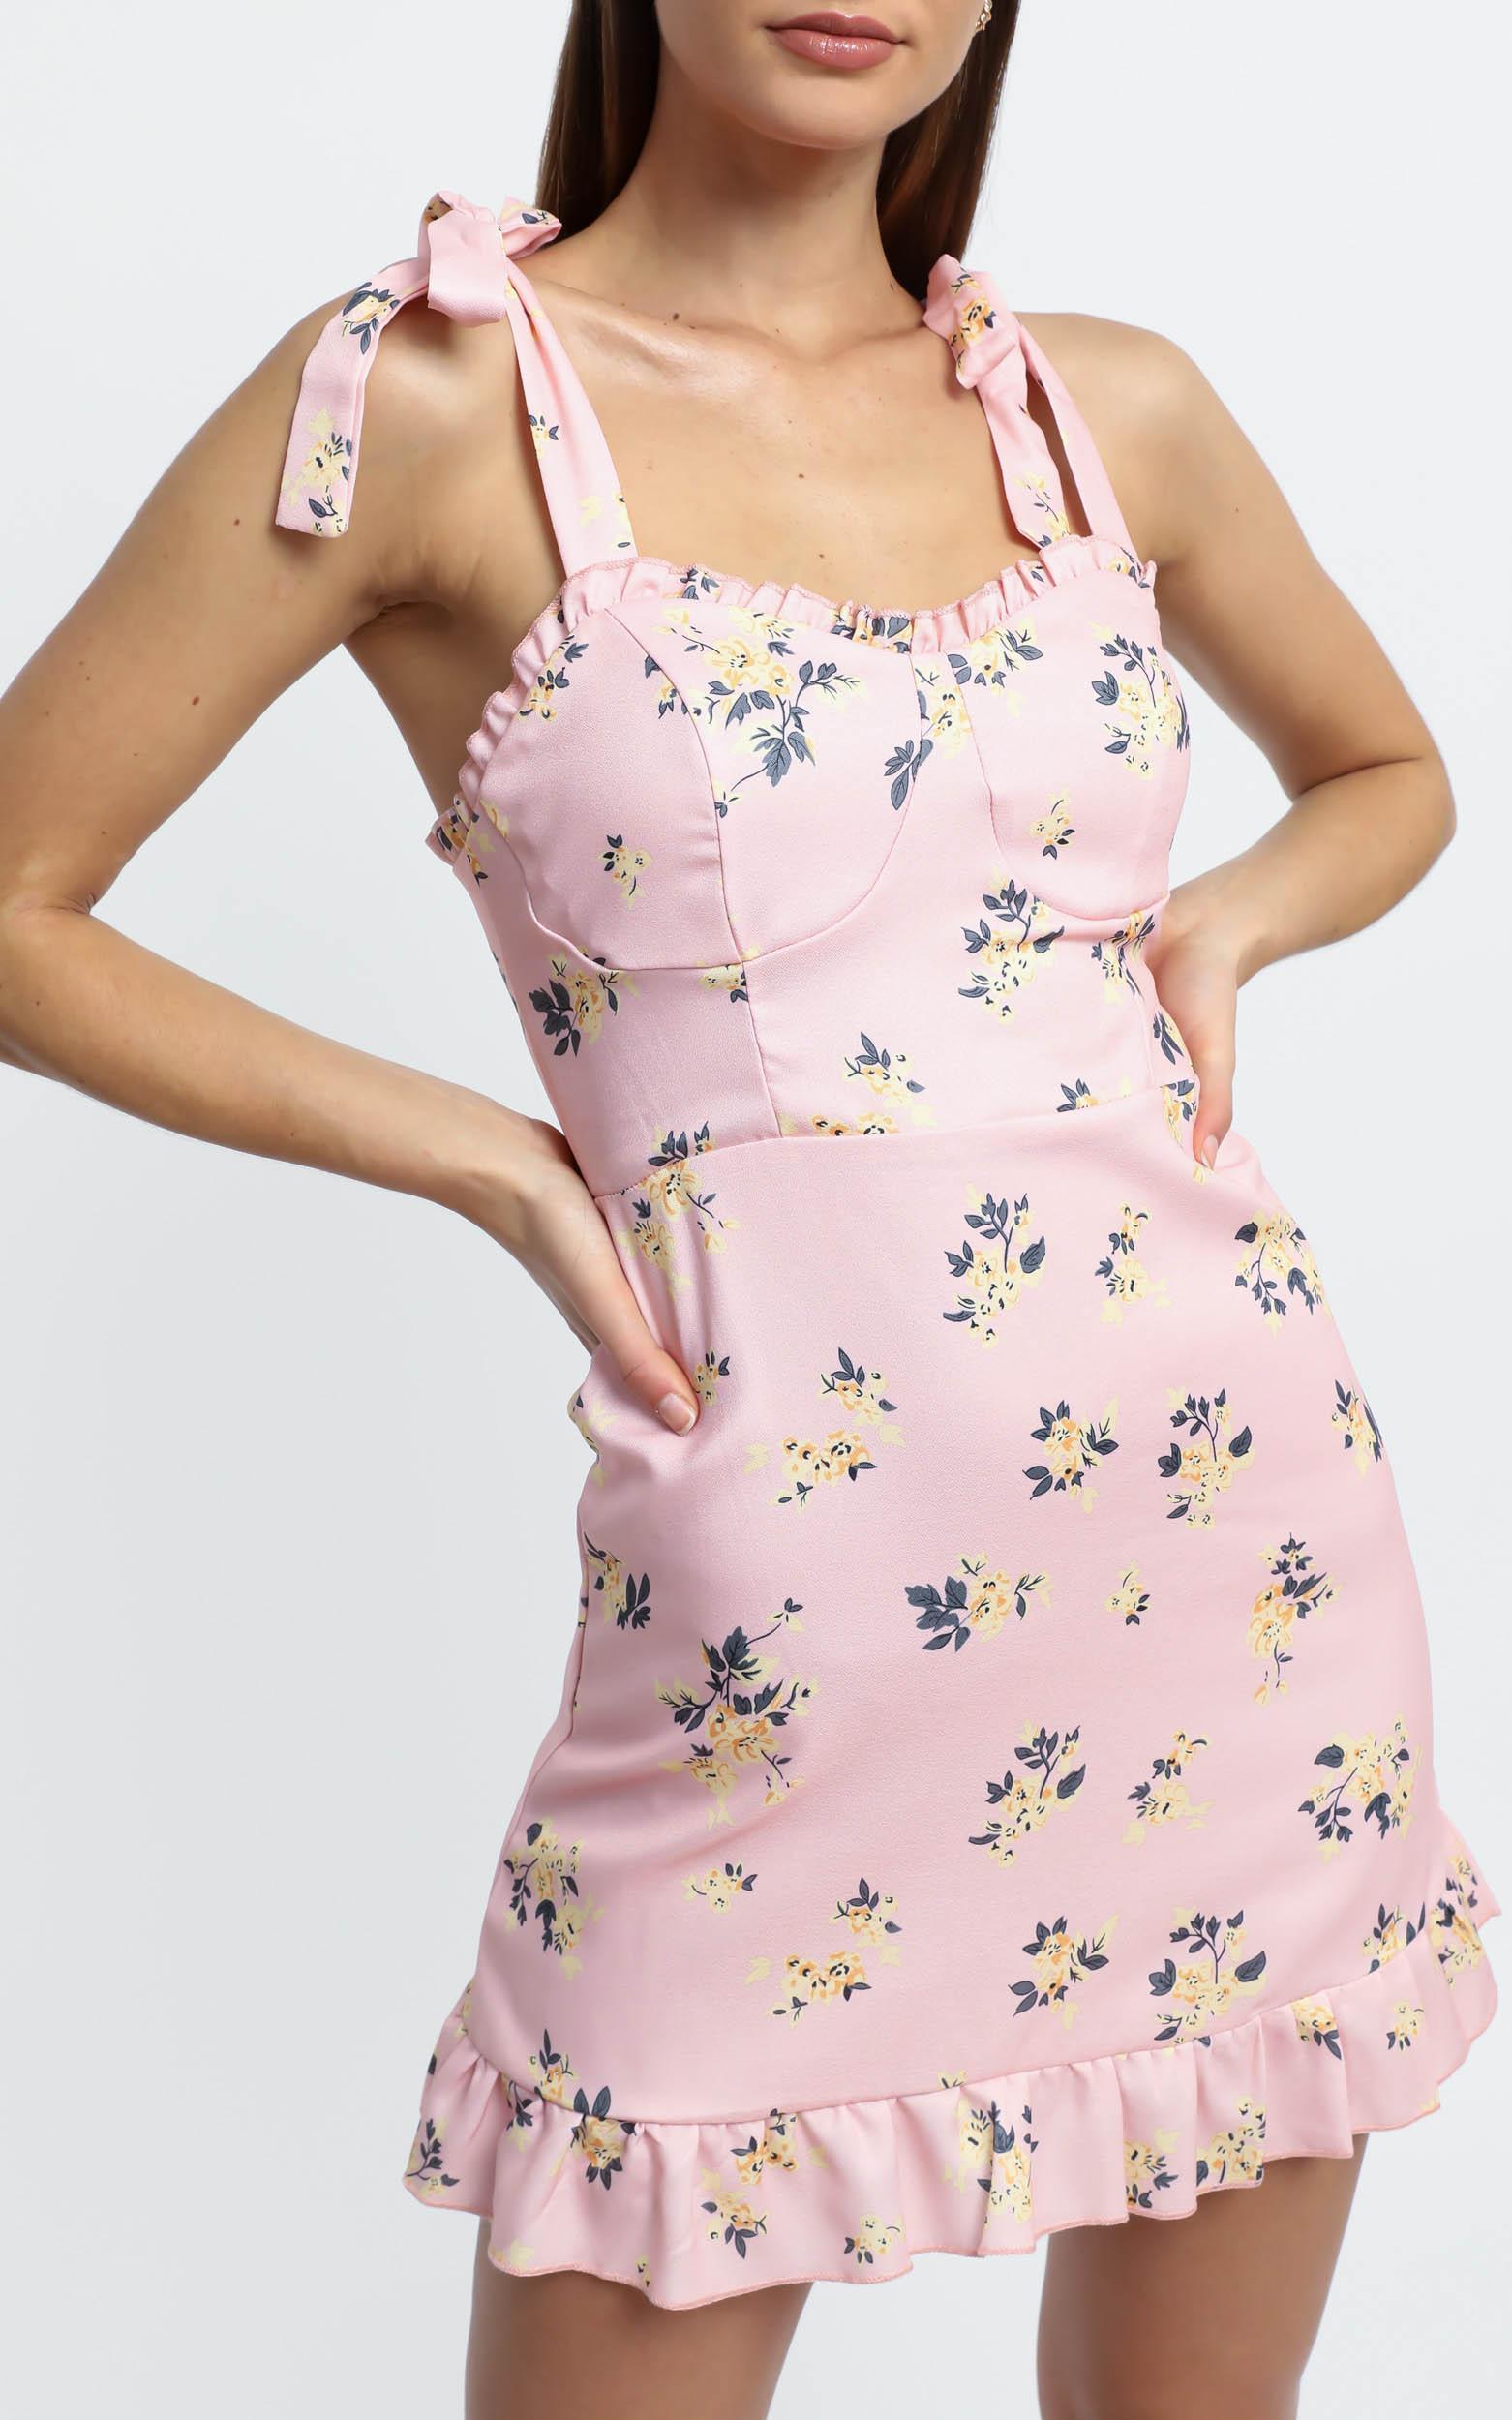 Zoelle Dress in Pink Floral - 8 (S), Pink, hi-res image number null